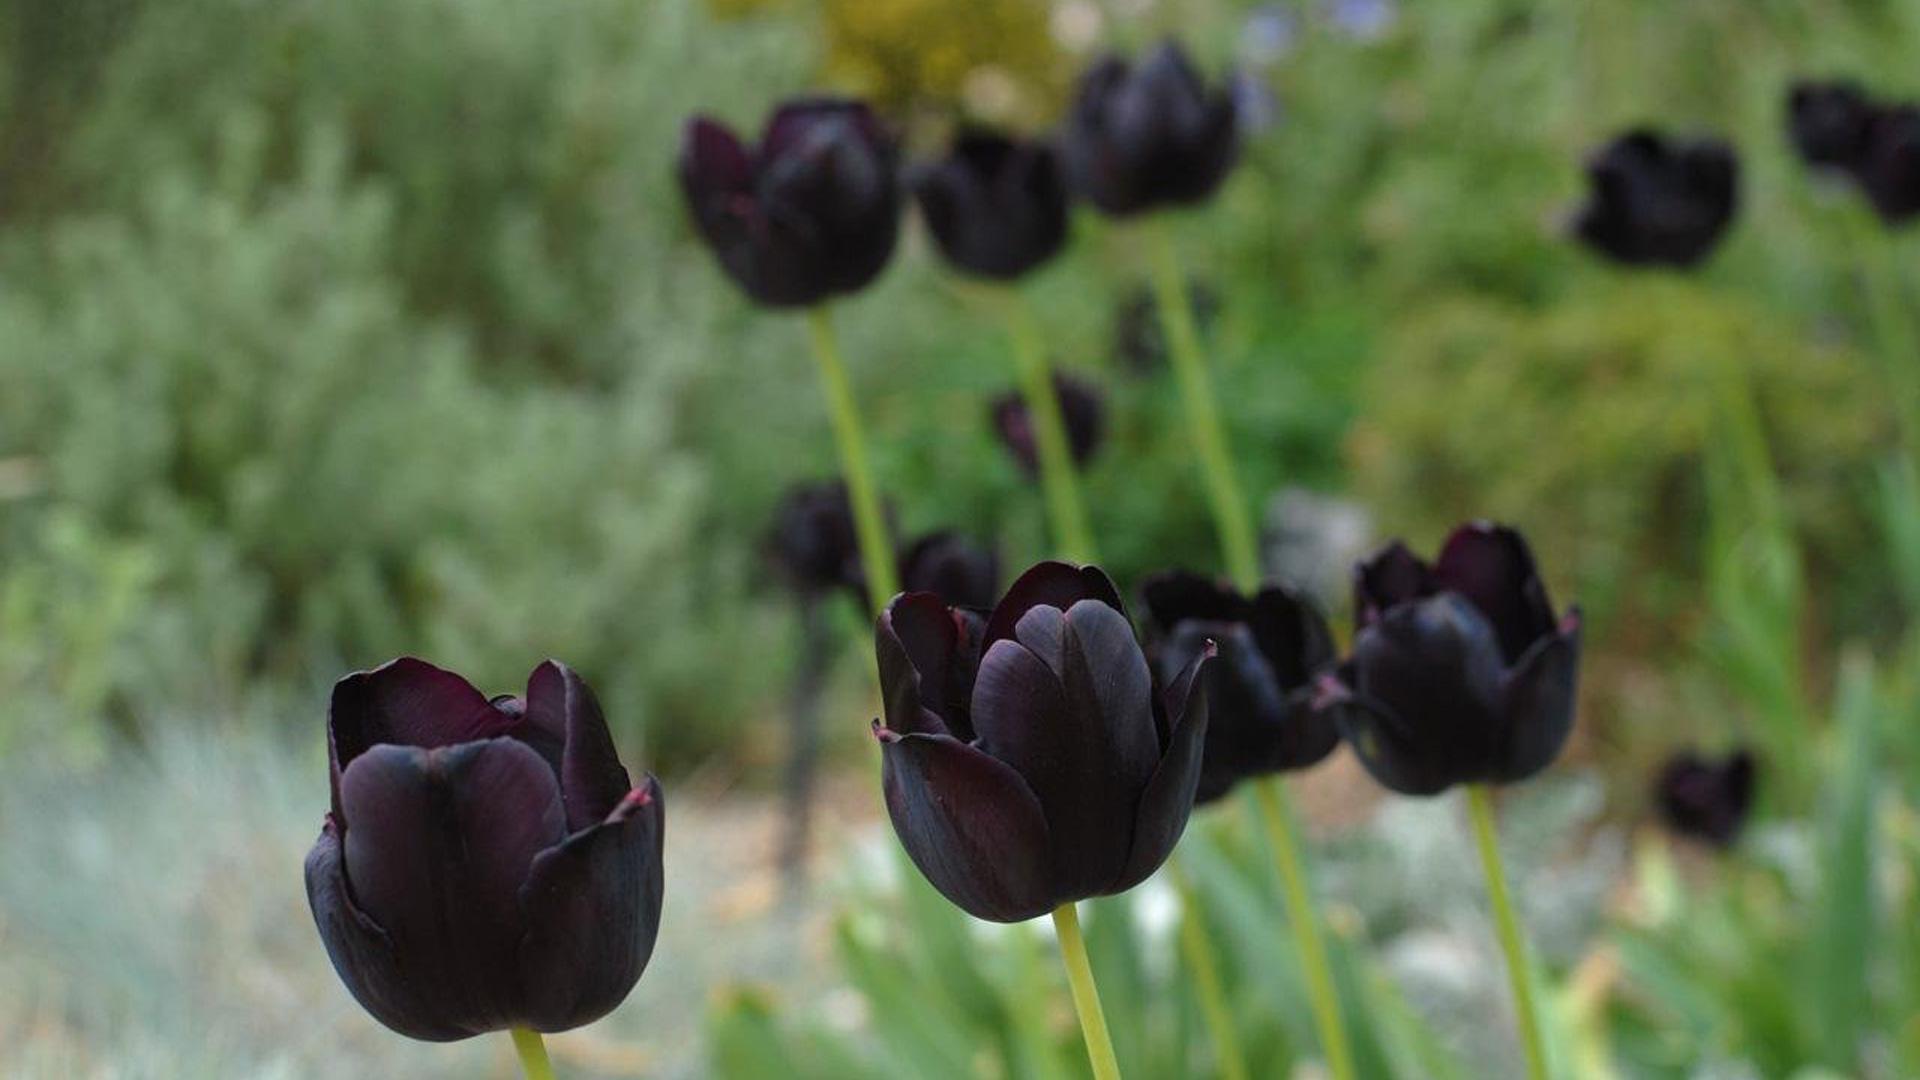 dark spooky plants for